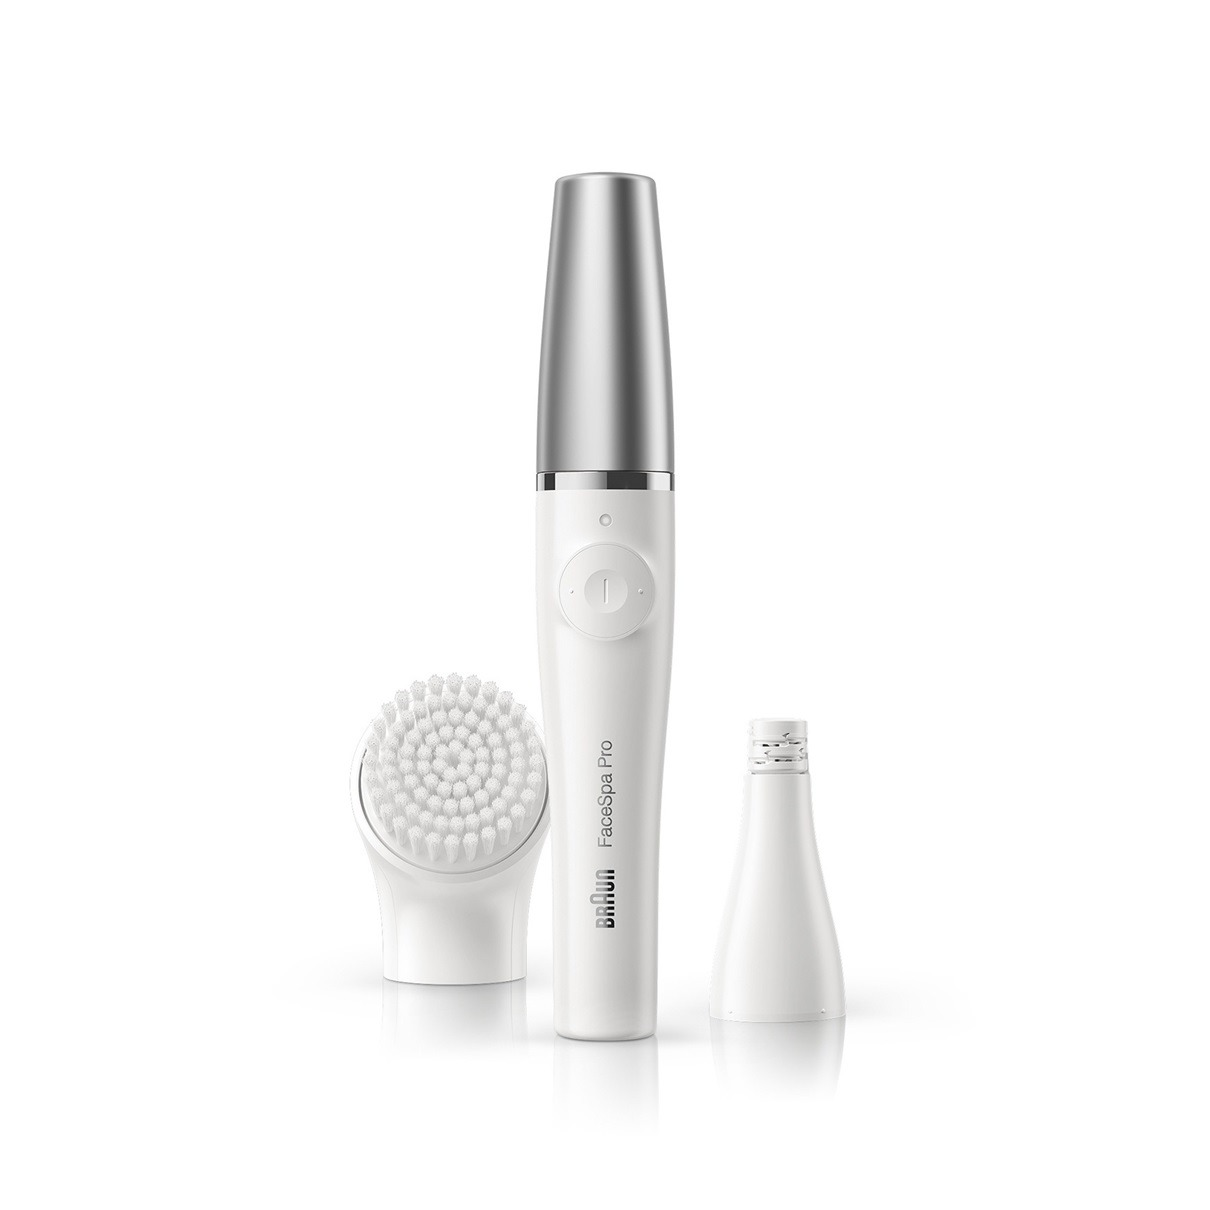 Korting Braun FaceSpa Pro 910 gezichtsreiniger